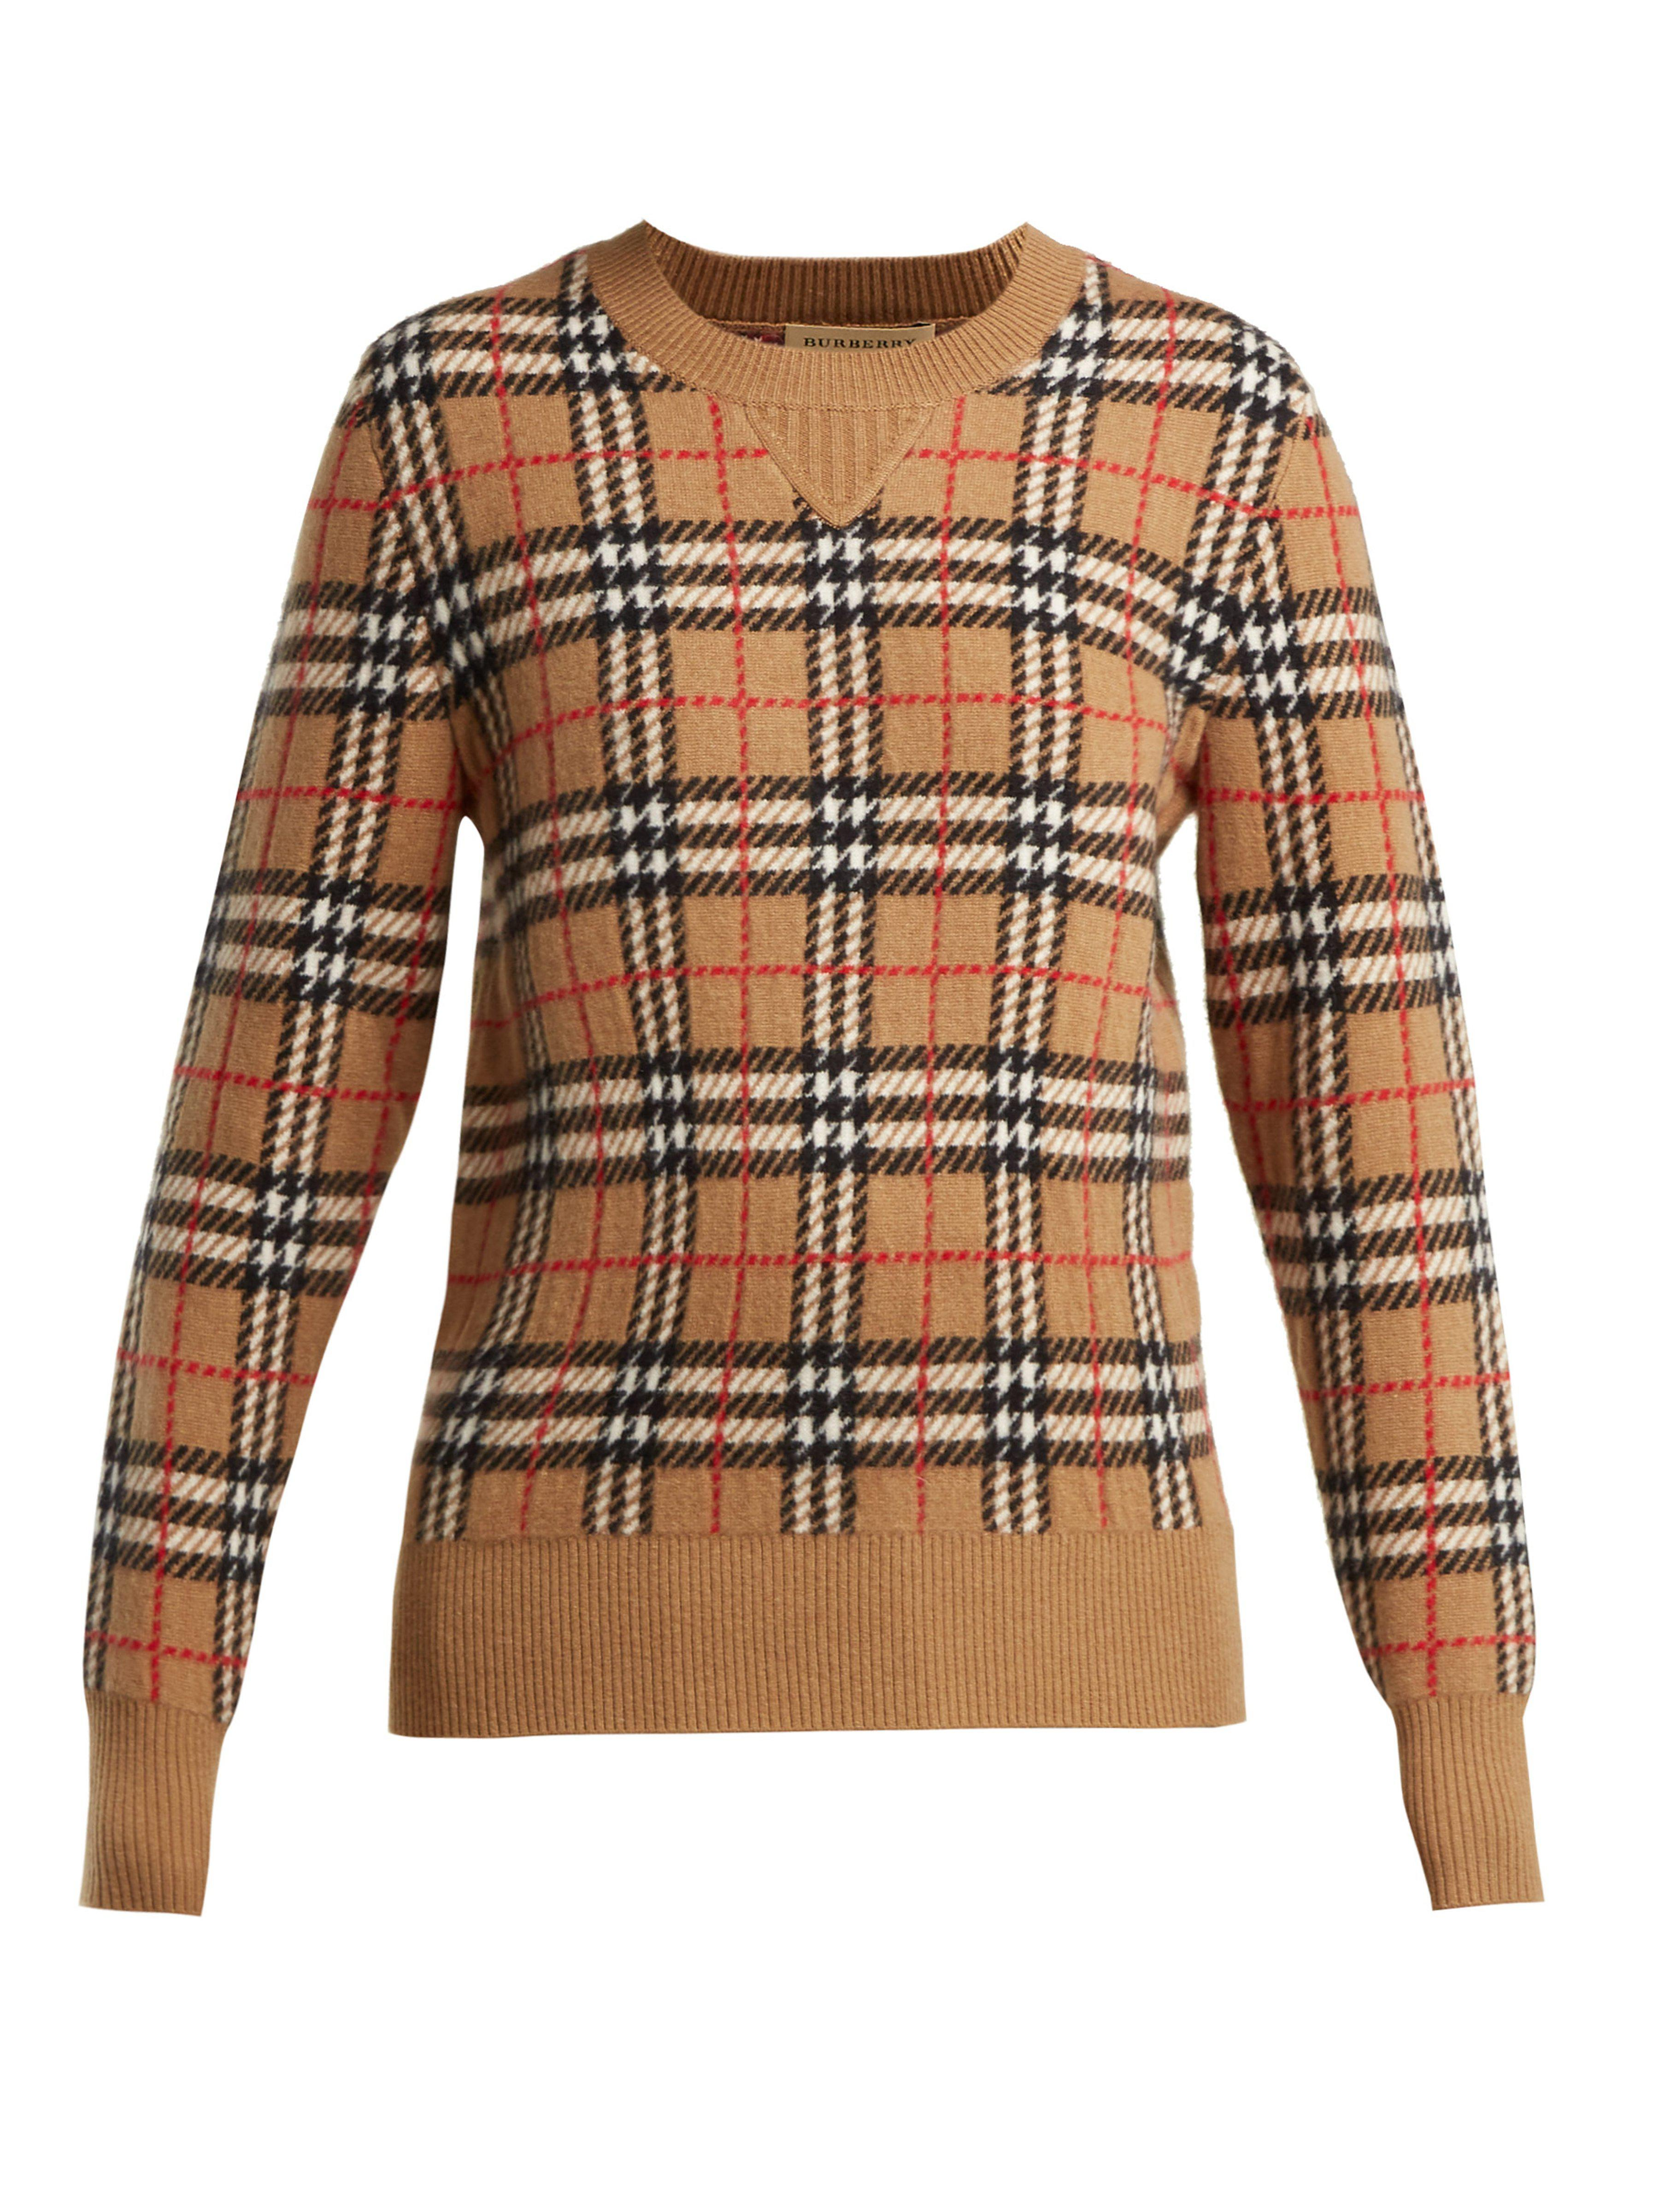 15e20c4e04ceb3 Burberry - Natural Banbury Vintage Check Cashmere Sweater - Lyst. View  fullscreen